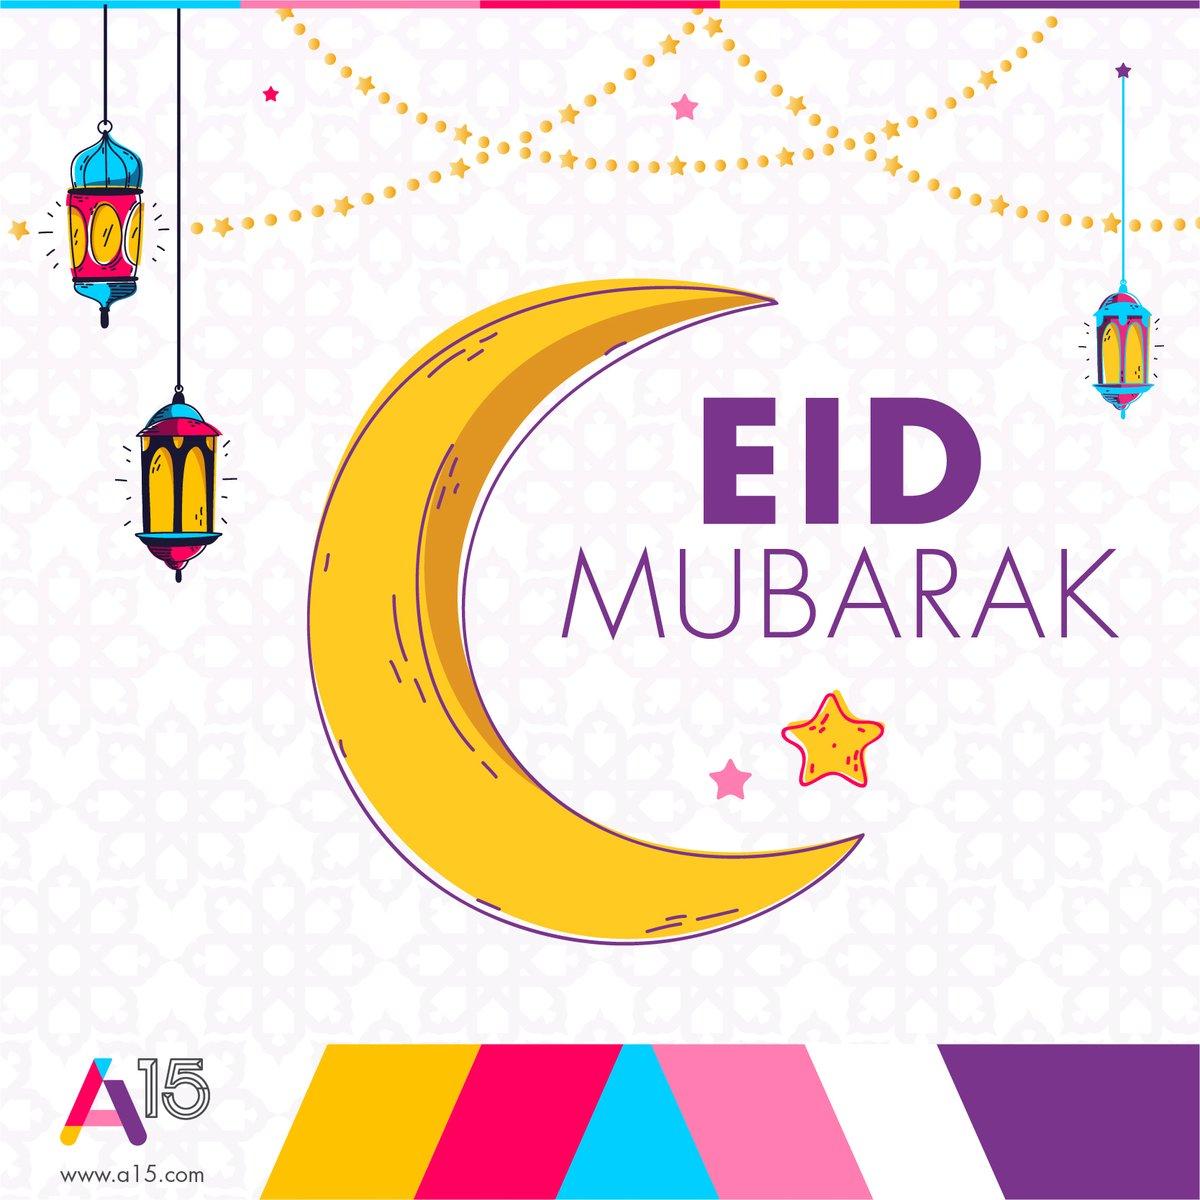 #A15_Family wishes you a happy Eid !! https://t.co/2HuUzmAiOA